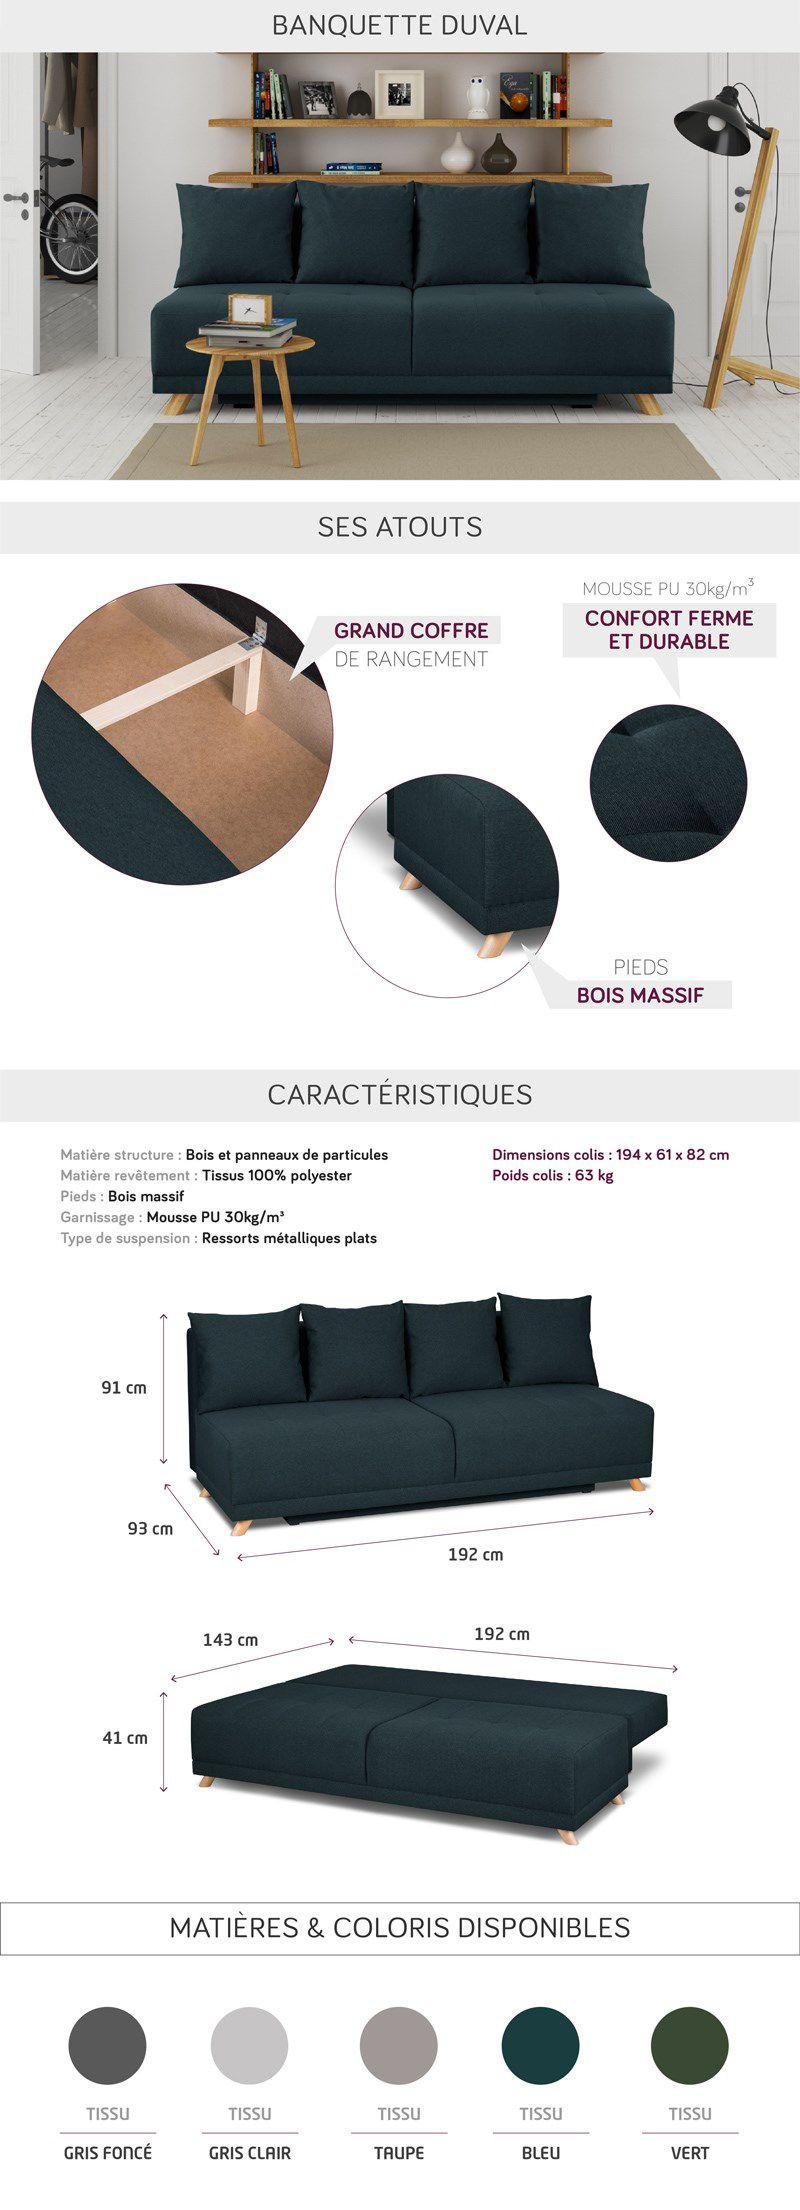 duval banquette convertible 3 places - tissu bleu canard - style